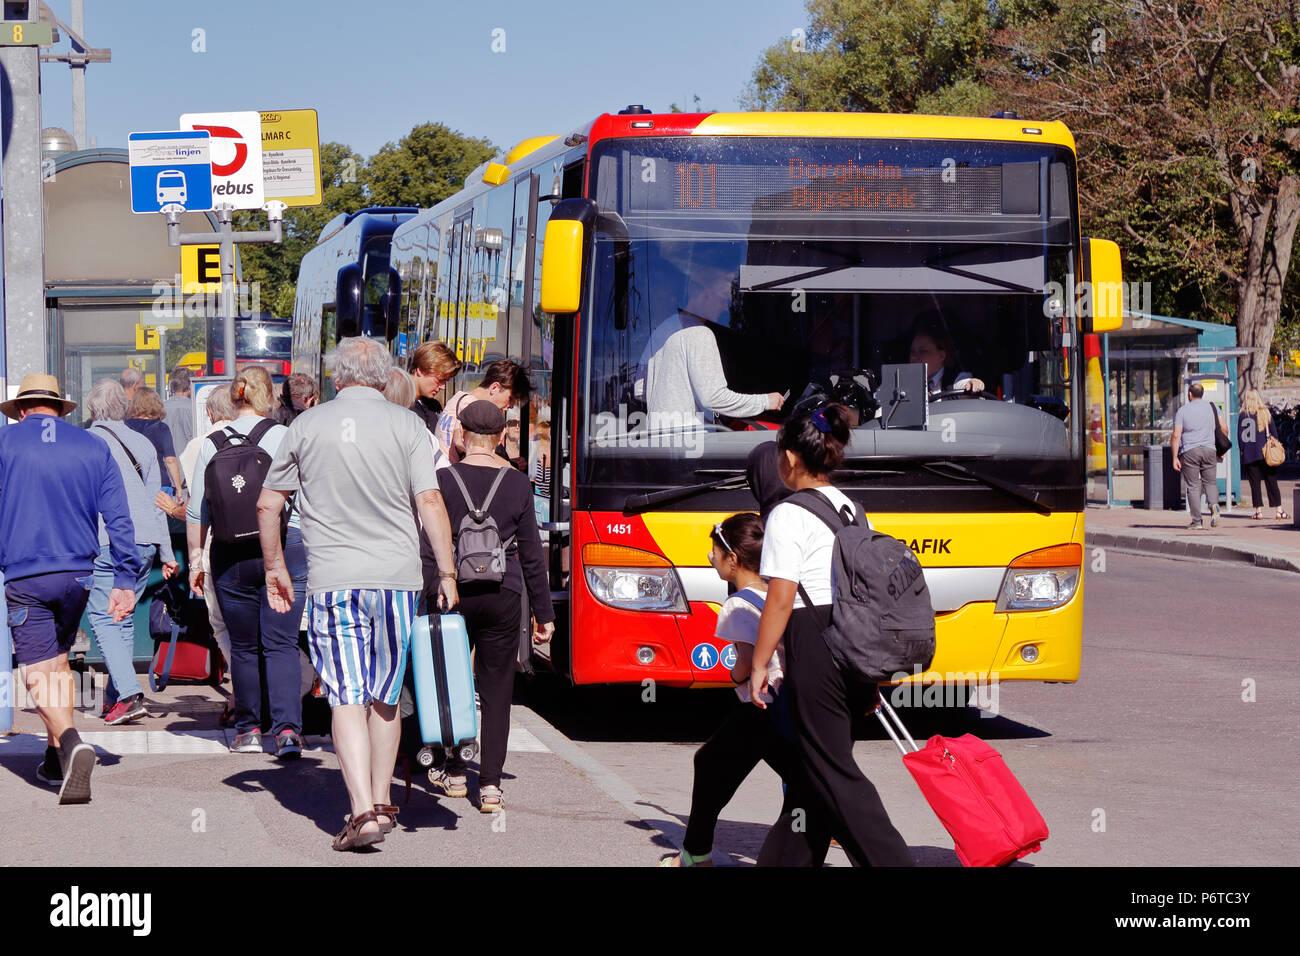 Kalmar, Sweden - June 28, 2018: Passengers at the Kalmar central station enter the public transportation bus with destination Byxelkrok via Borgholm o Stock Photo